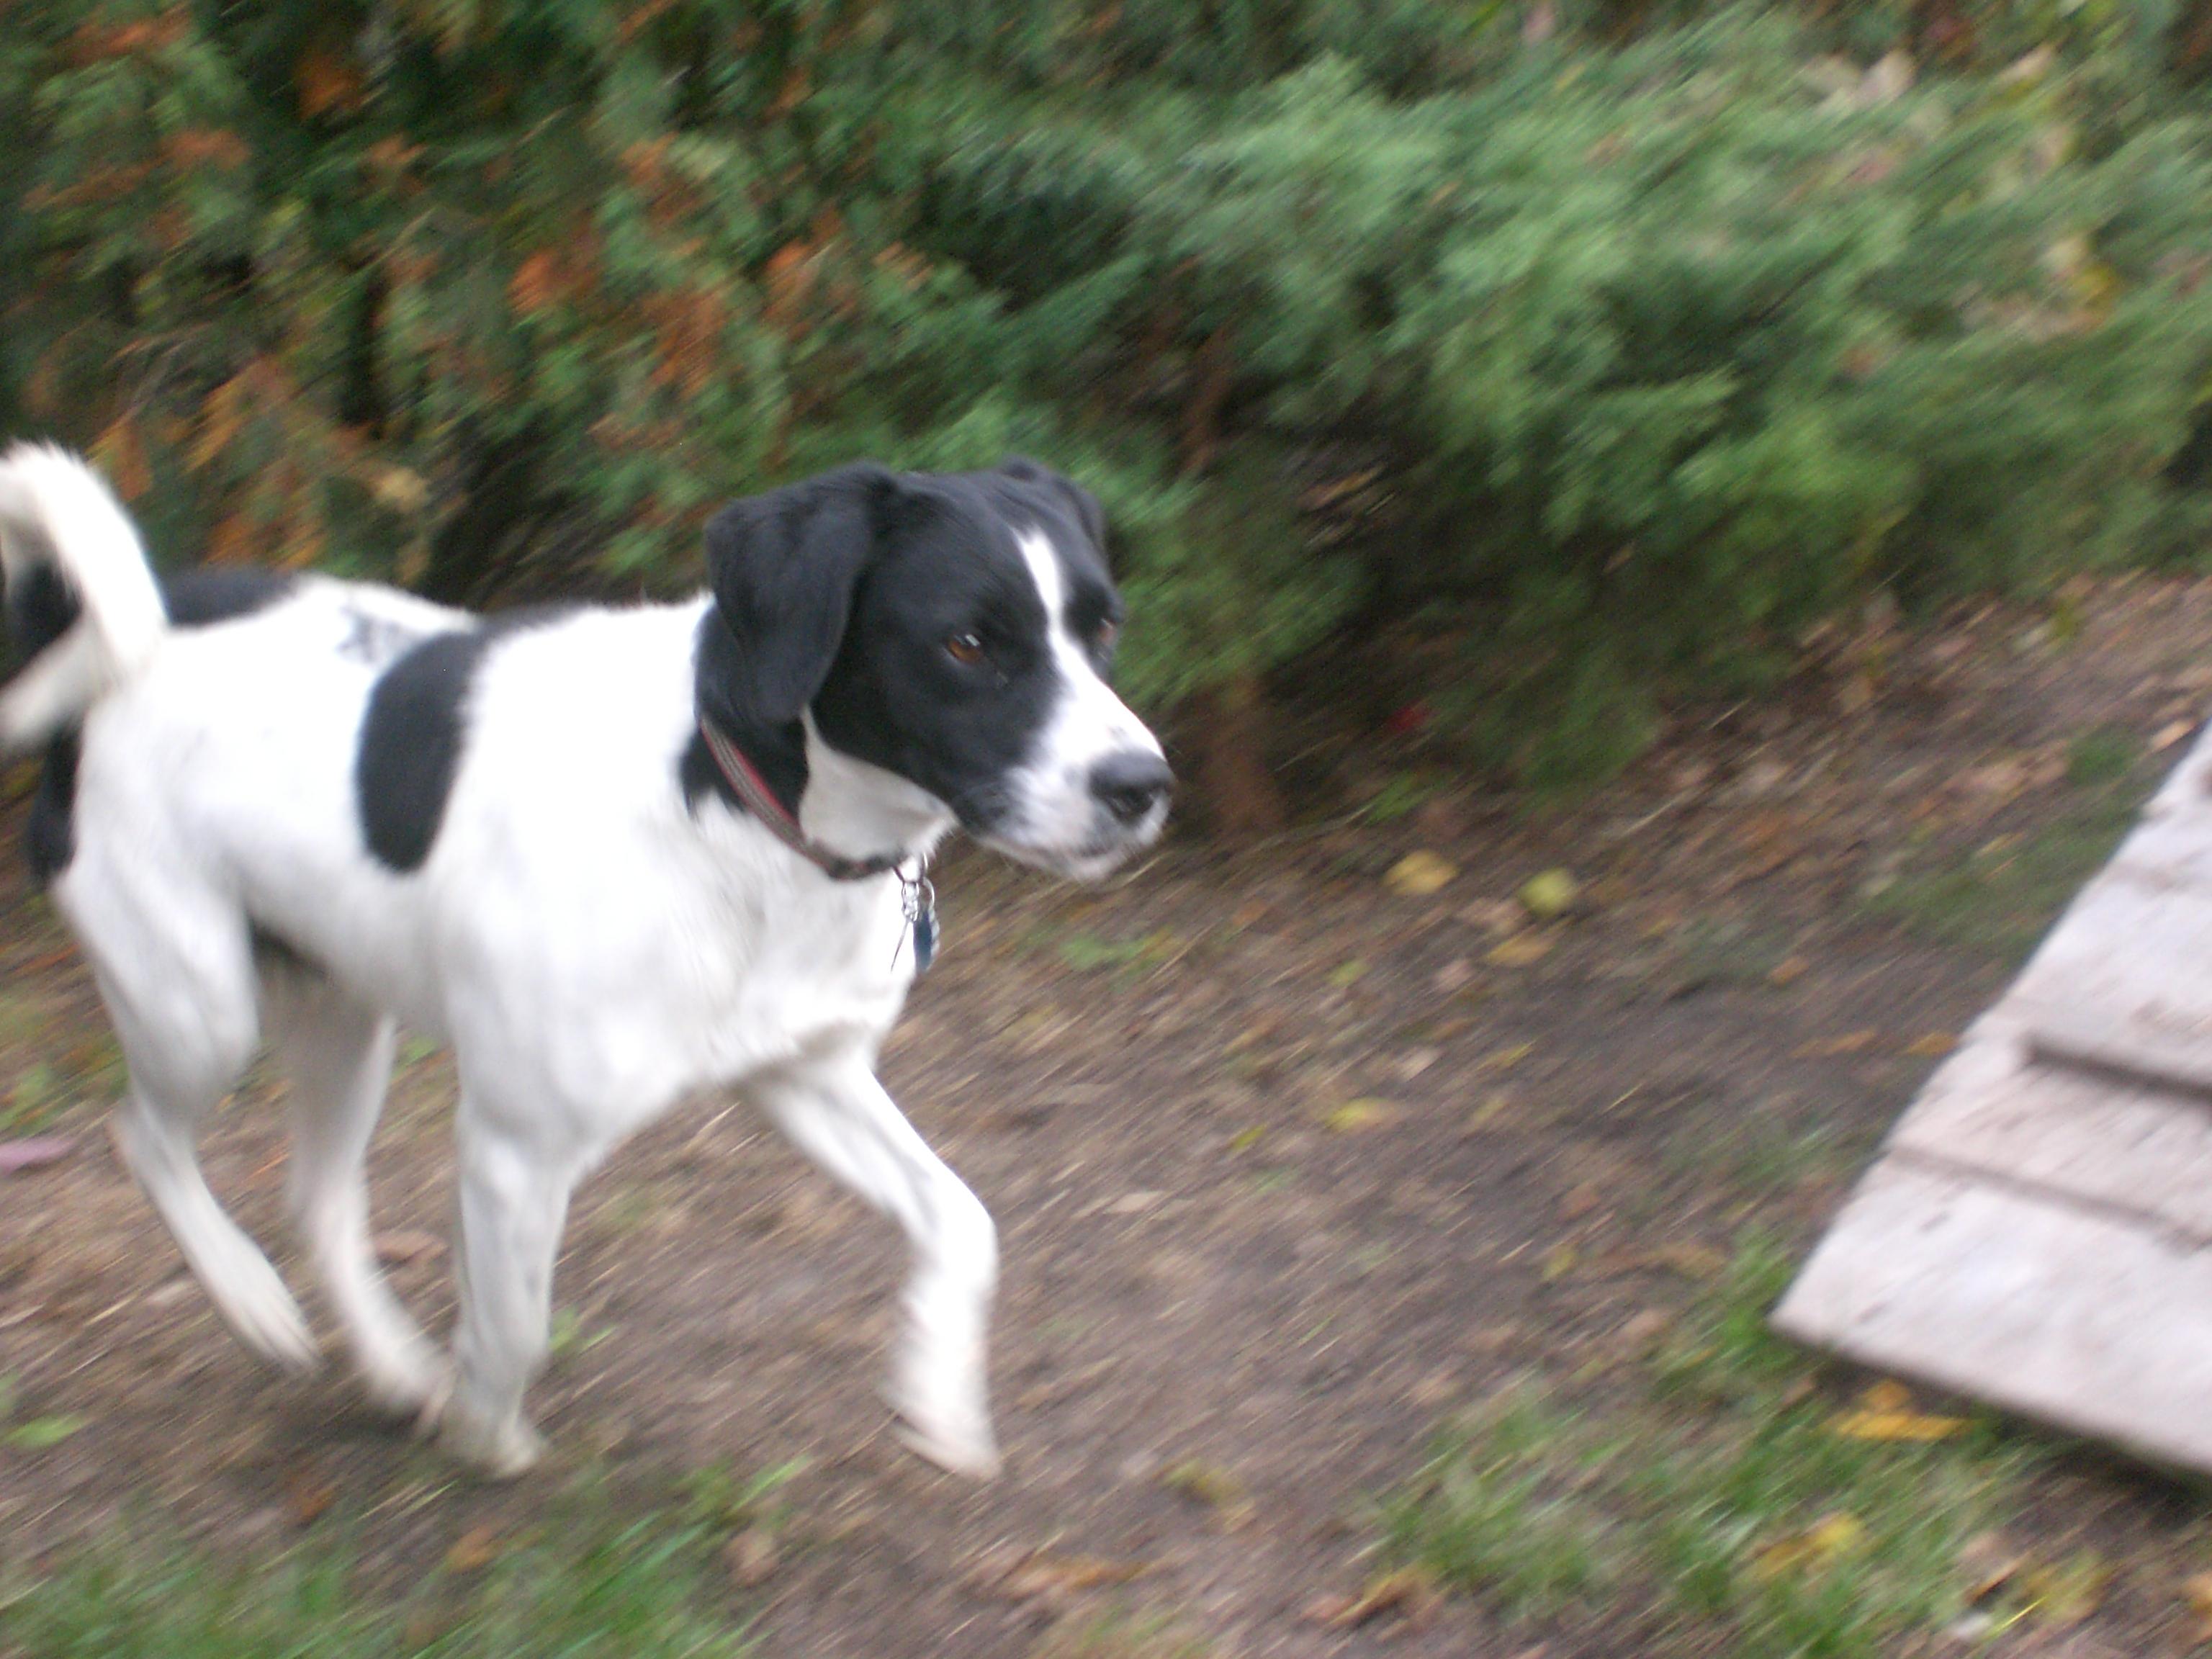 Most Inspiring Super Cute Beagle Adorable Dog - cimg8151  Snapshot_42828  .jpg